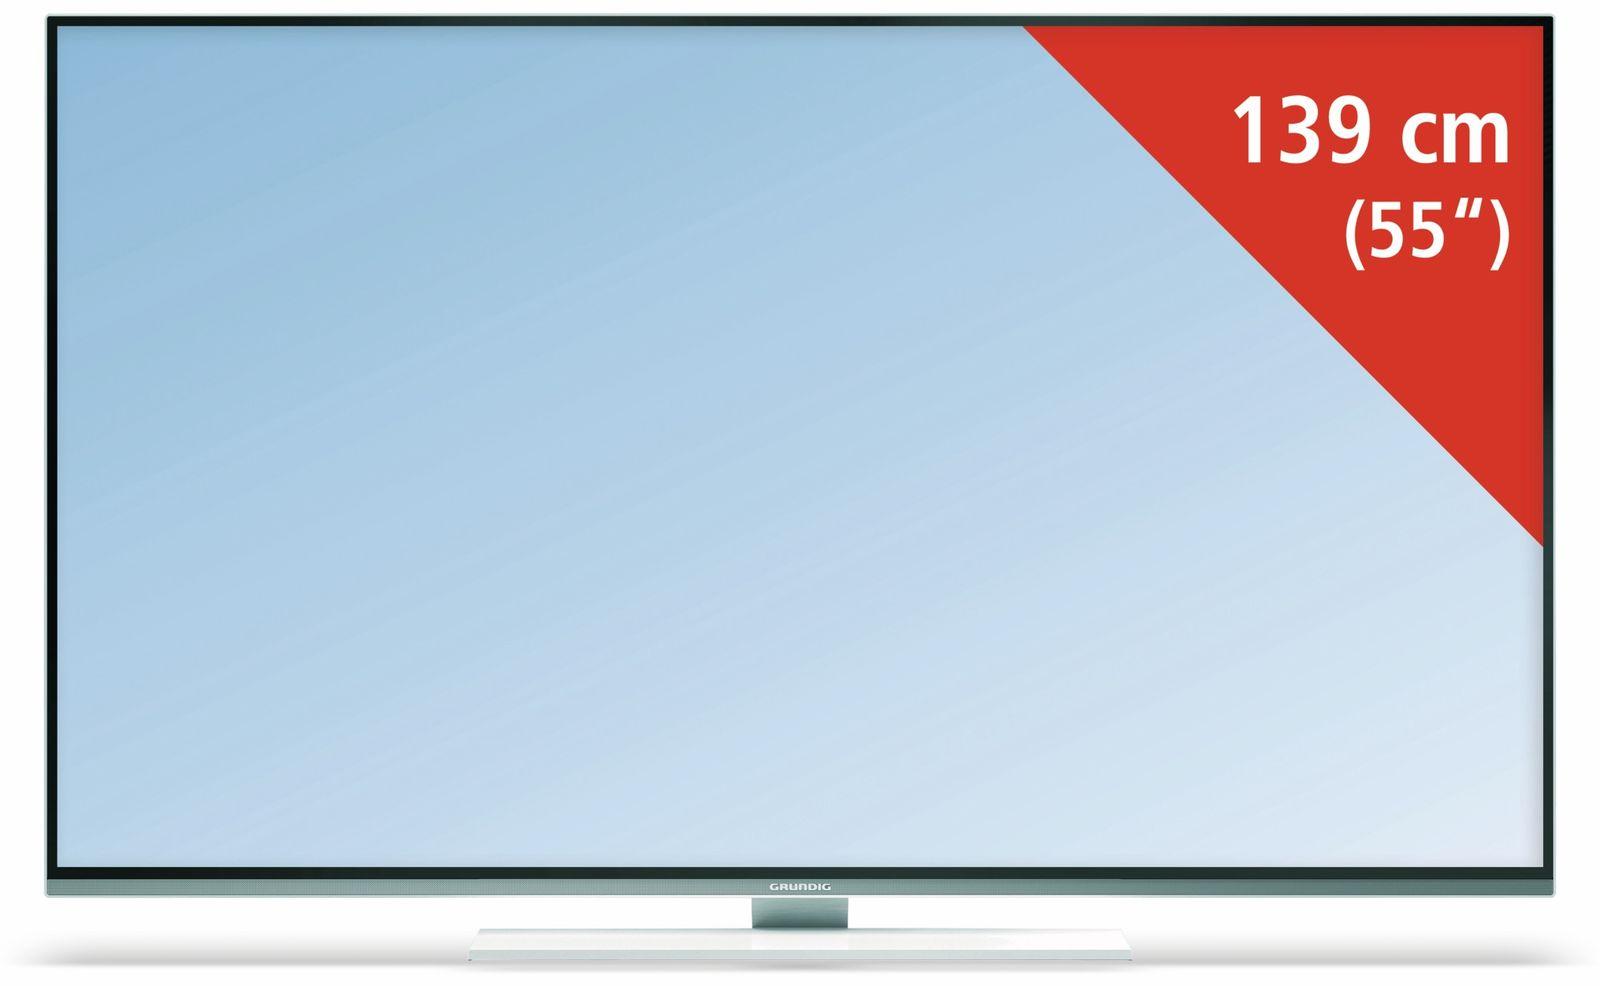 LED-TV GRUNDIG 55 GUW 8678, EEK: A